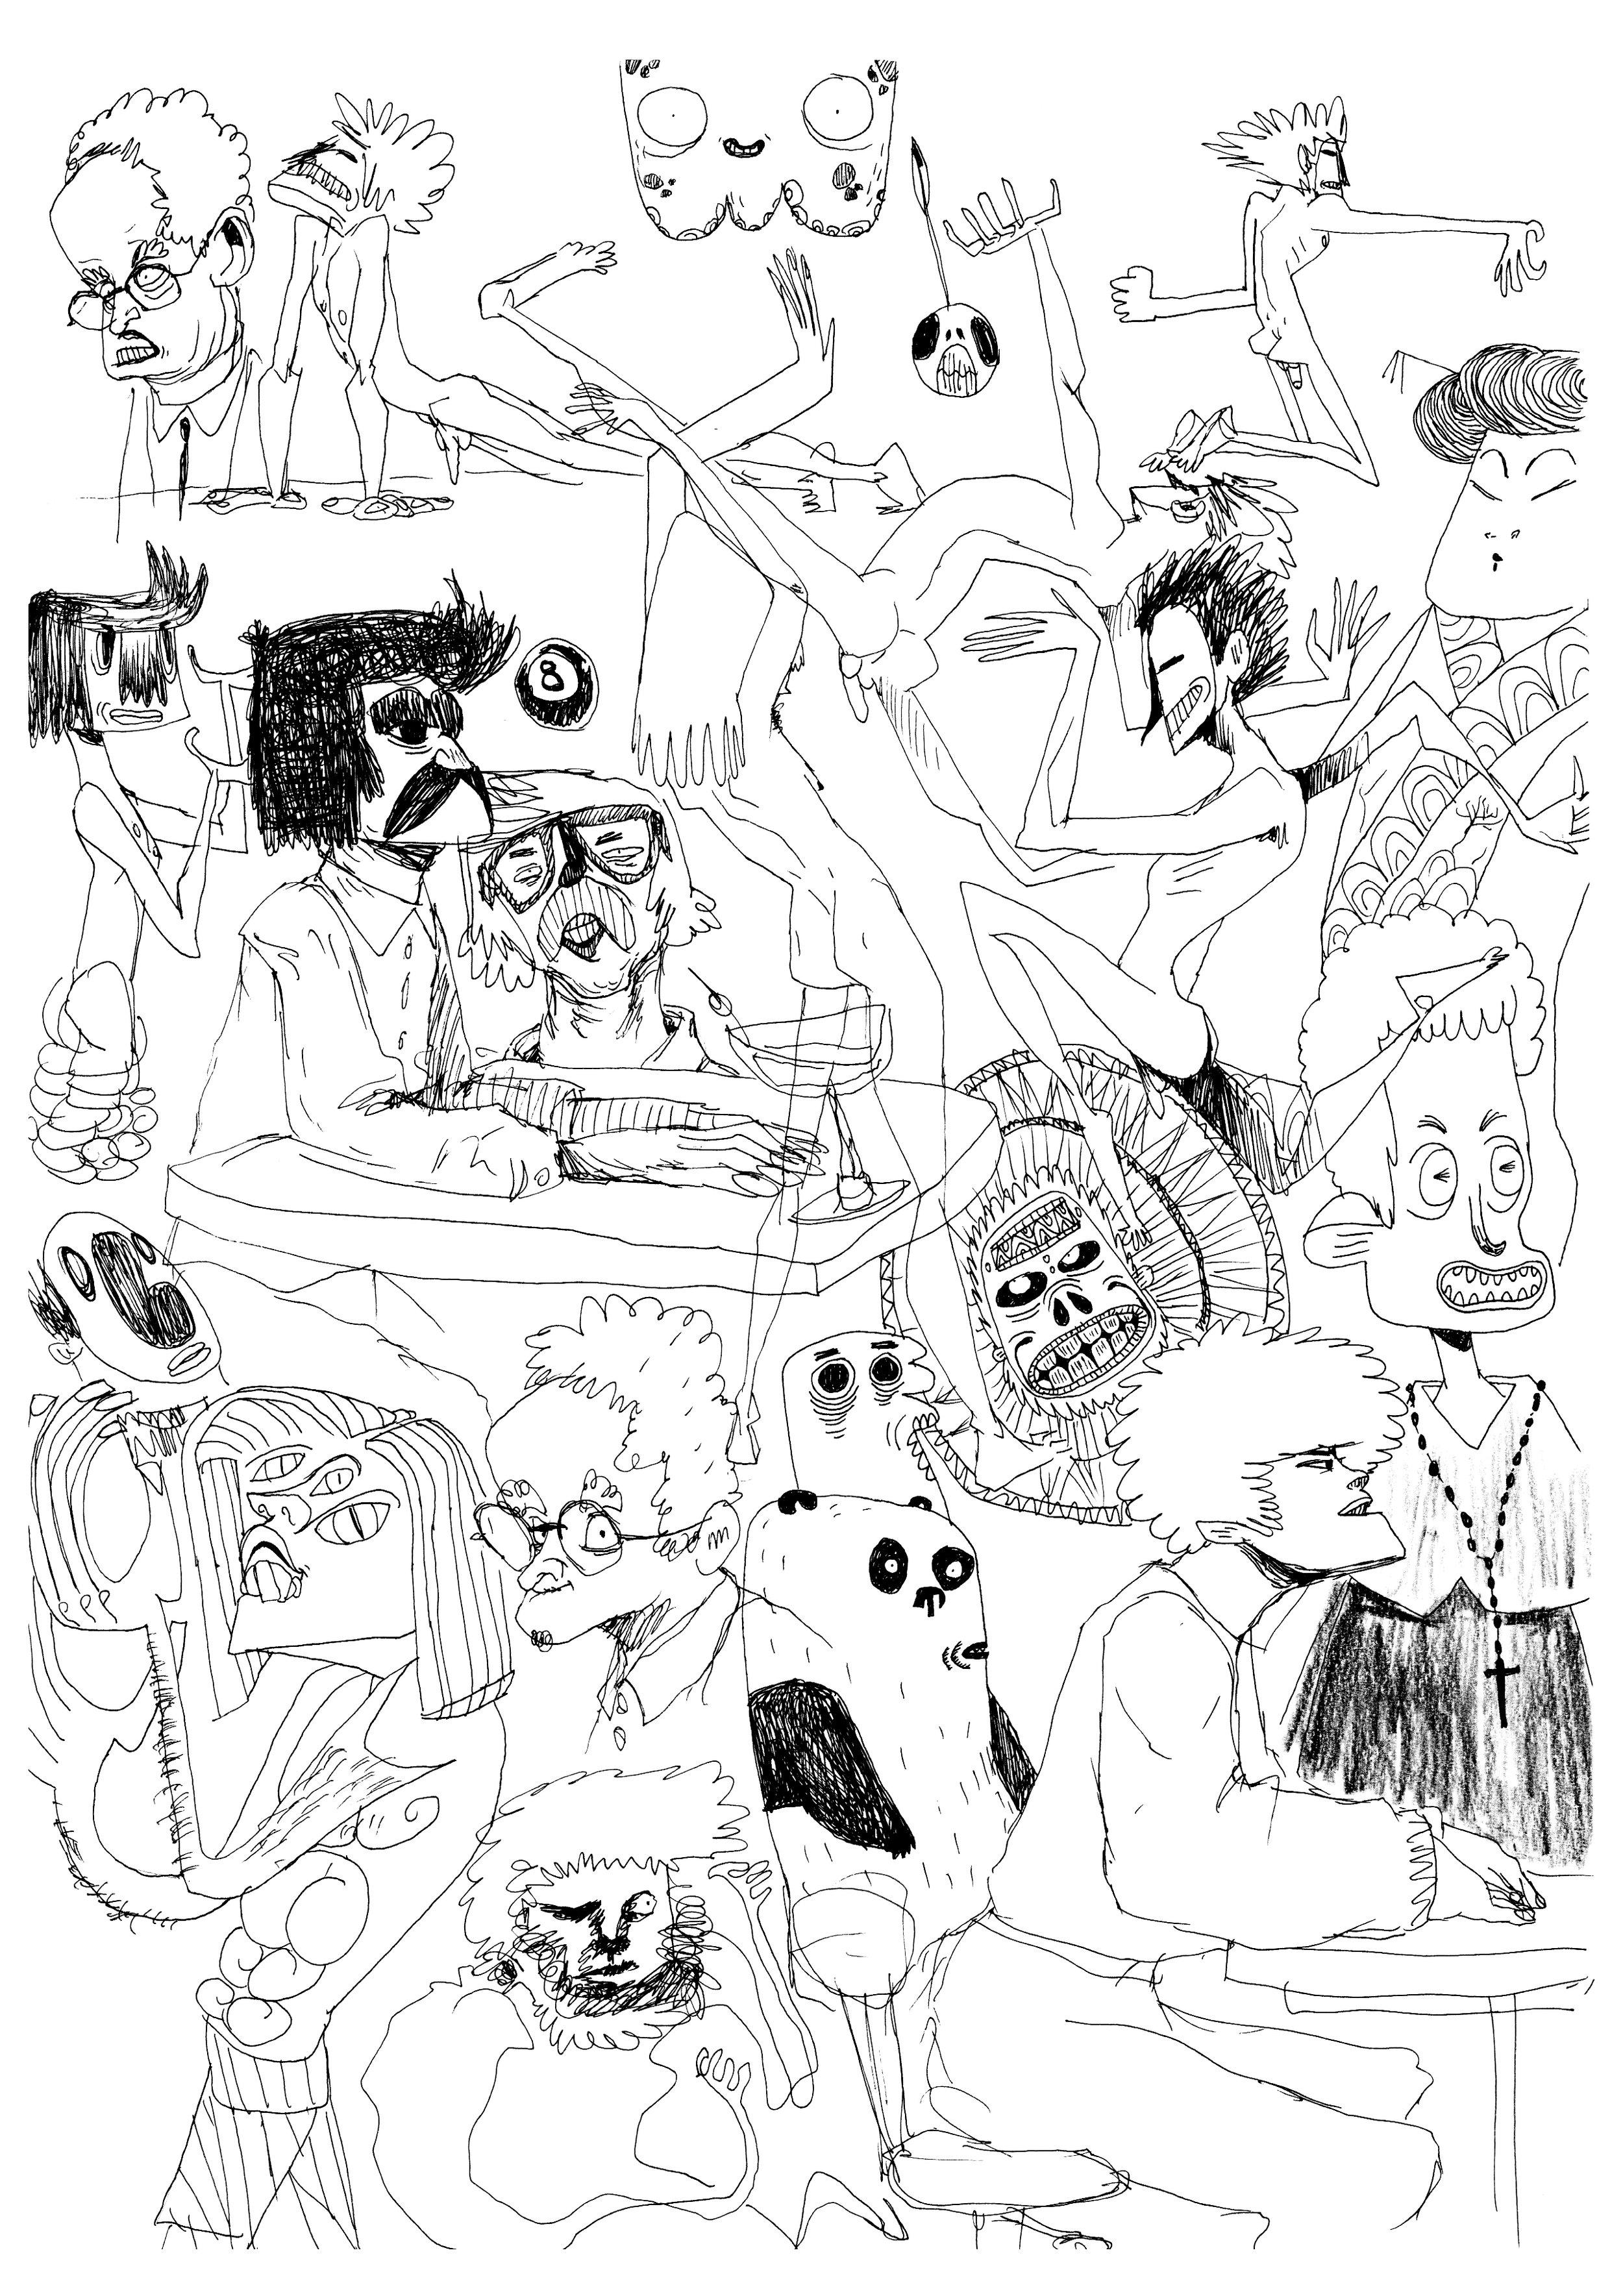 Pascal_Zaffiro_Doodle_22.jpg